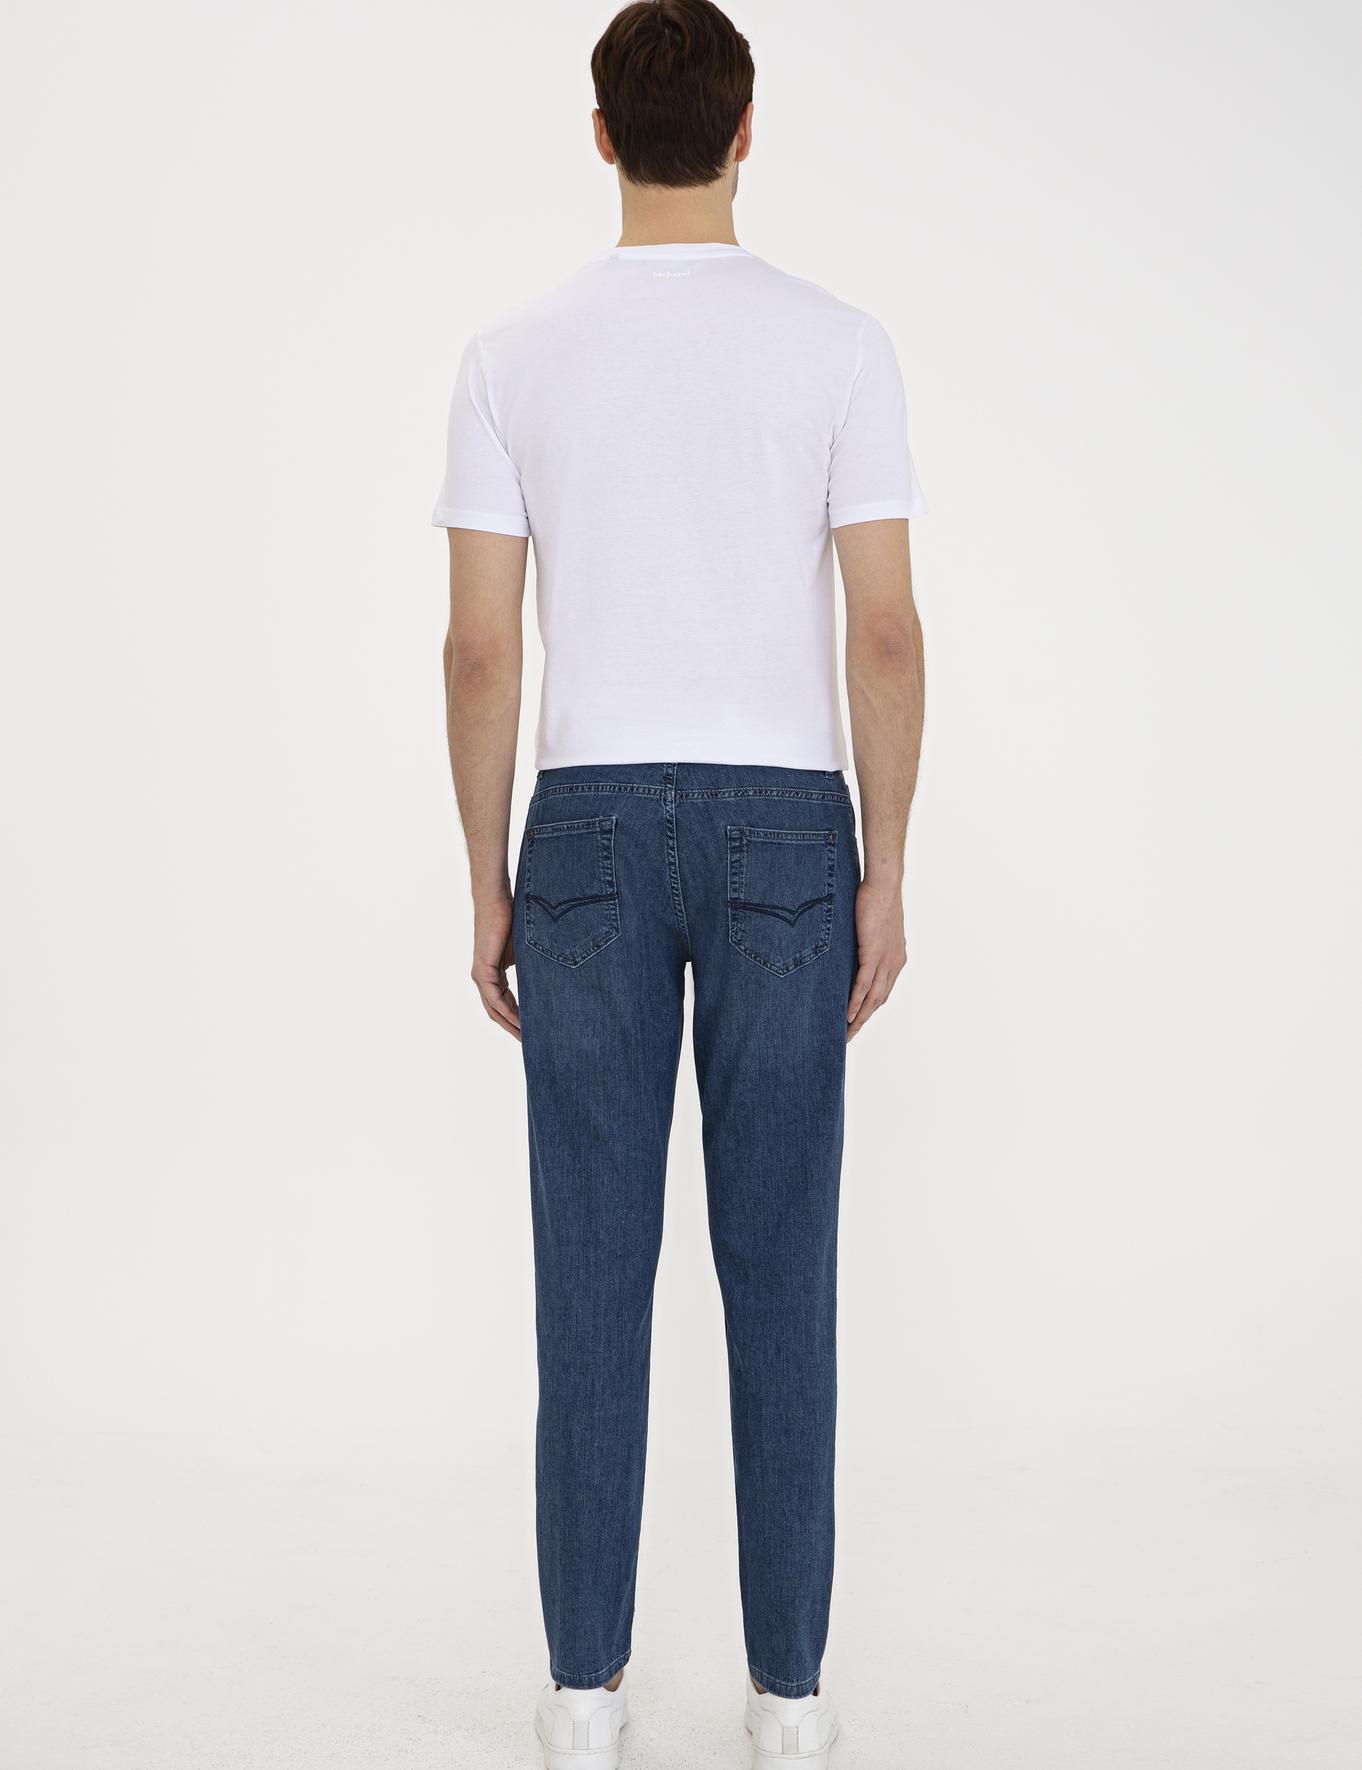 Mavi Slim Fit Denim - 50232821009